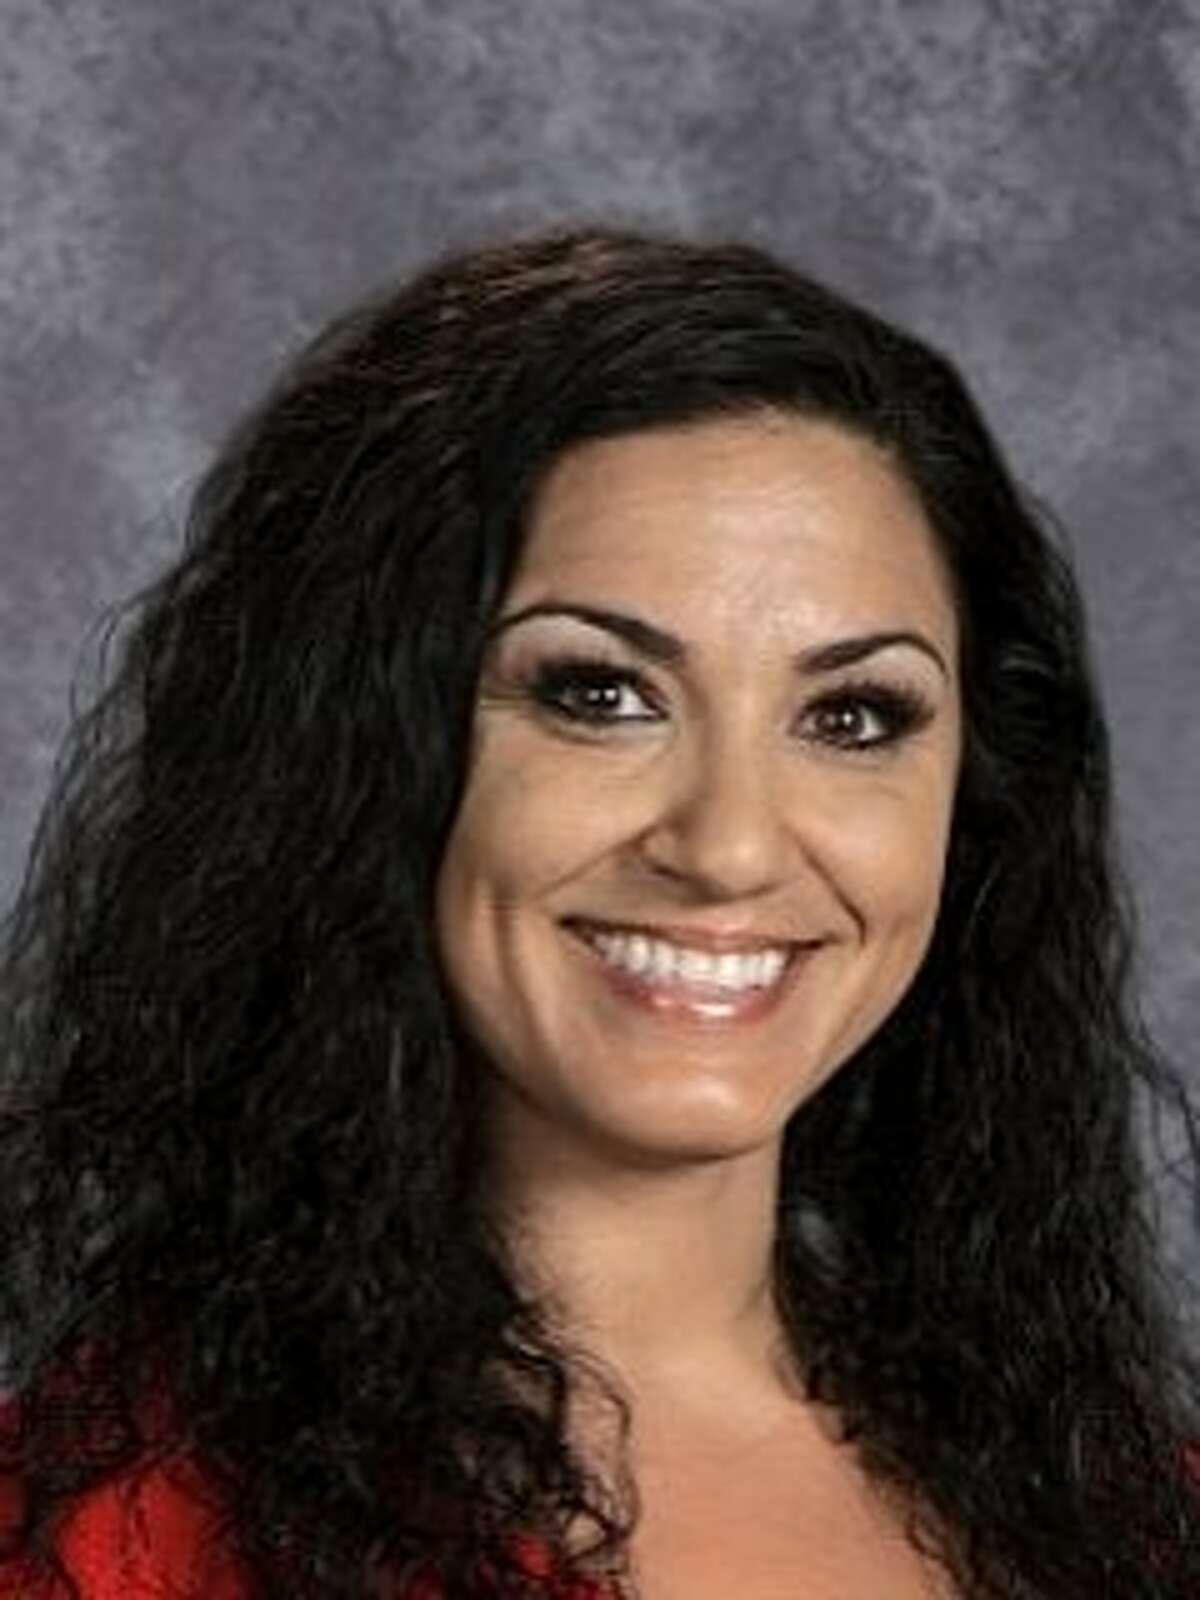 Jennifer Parks, a California kindergarten teacher, was among the people killed in the Las Vegas massacre